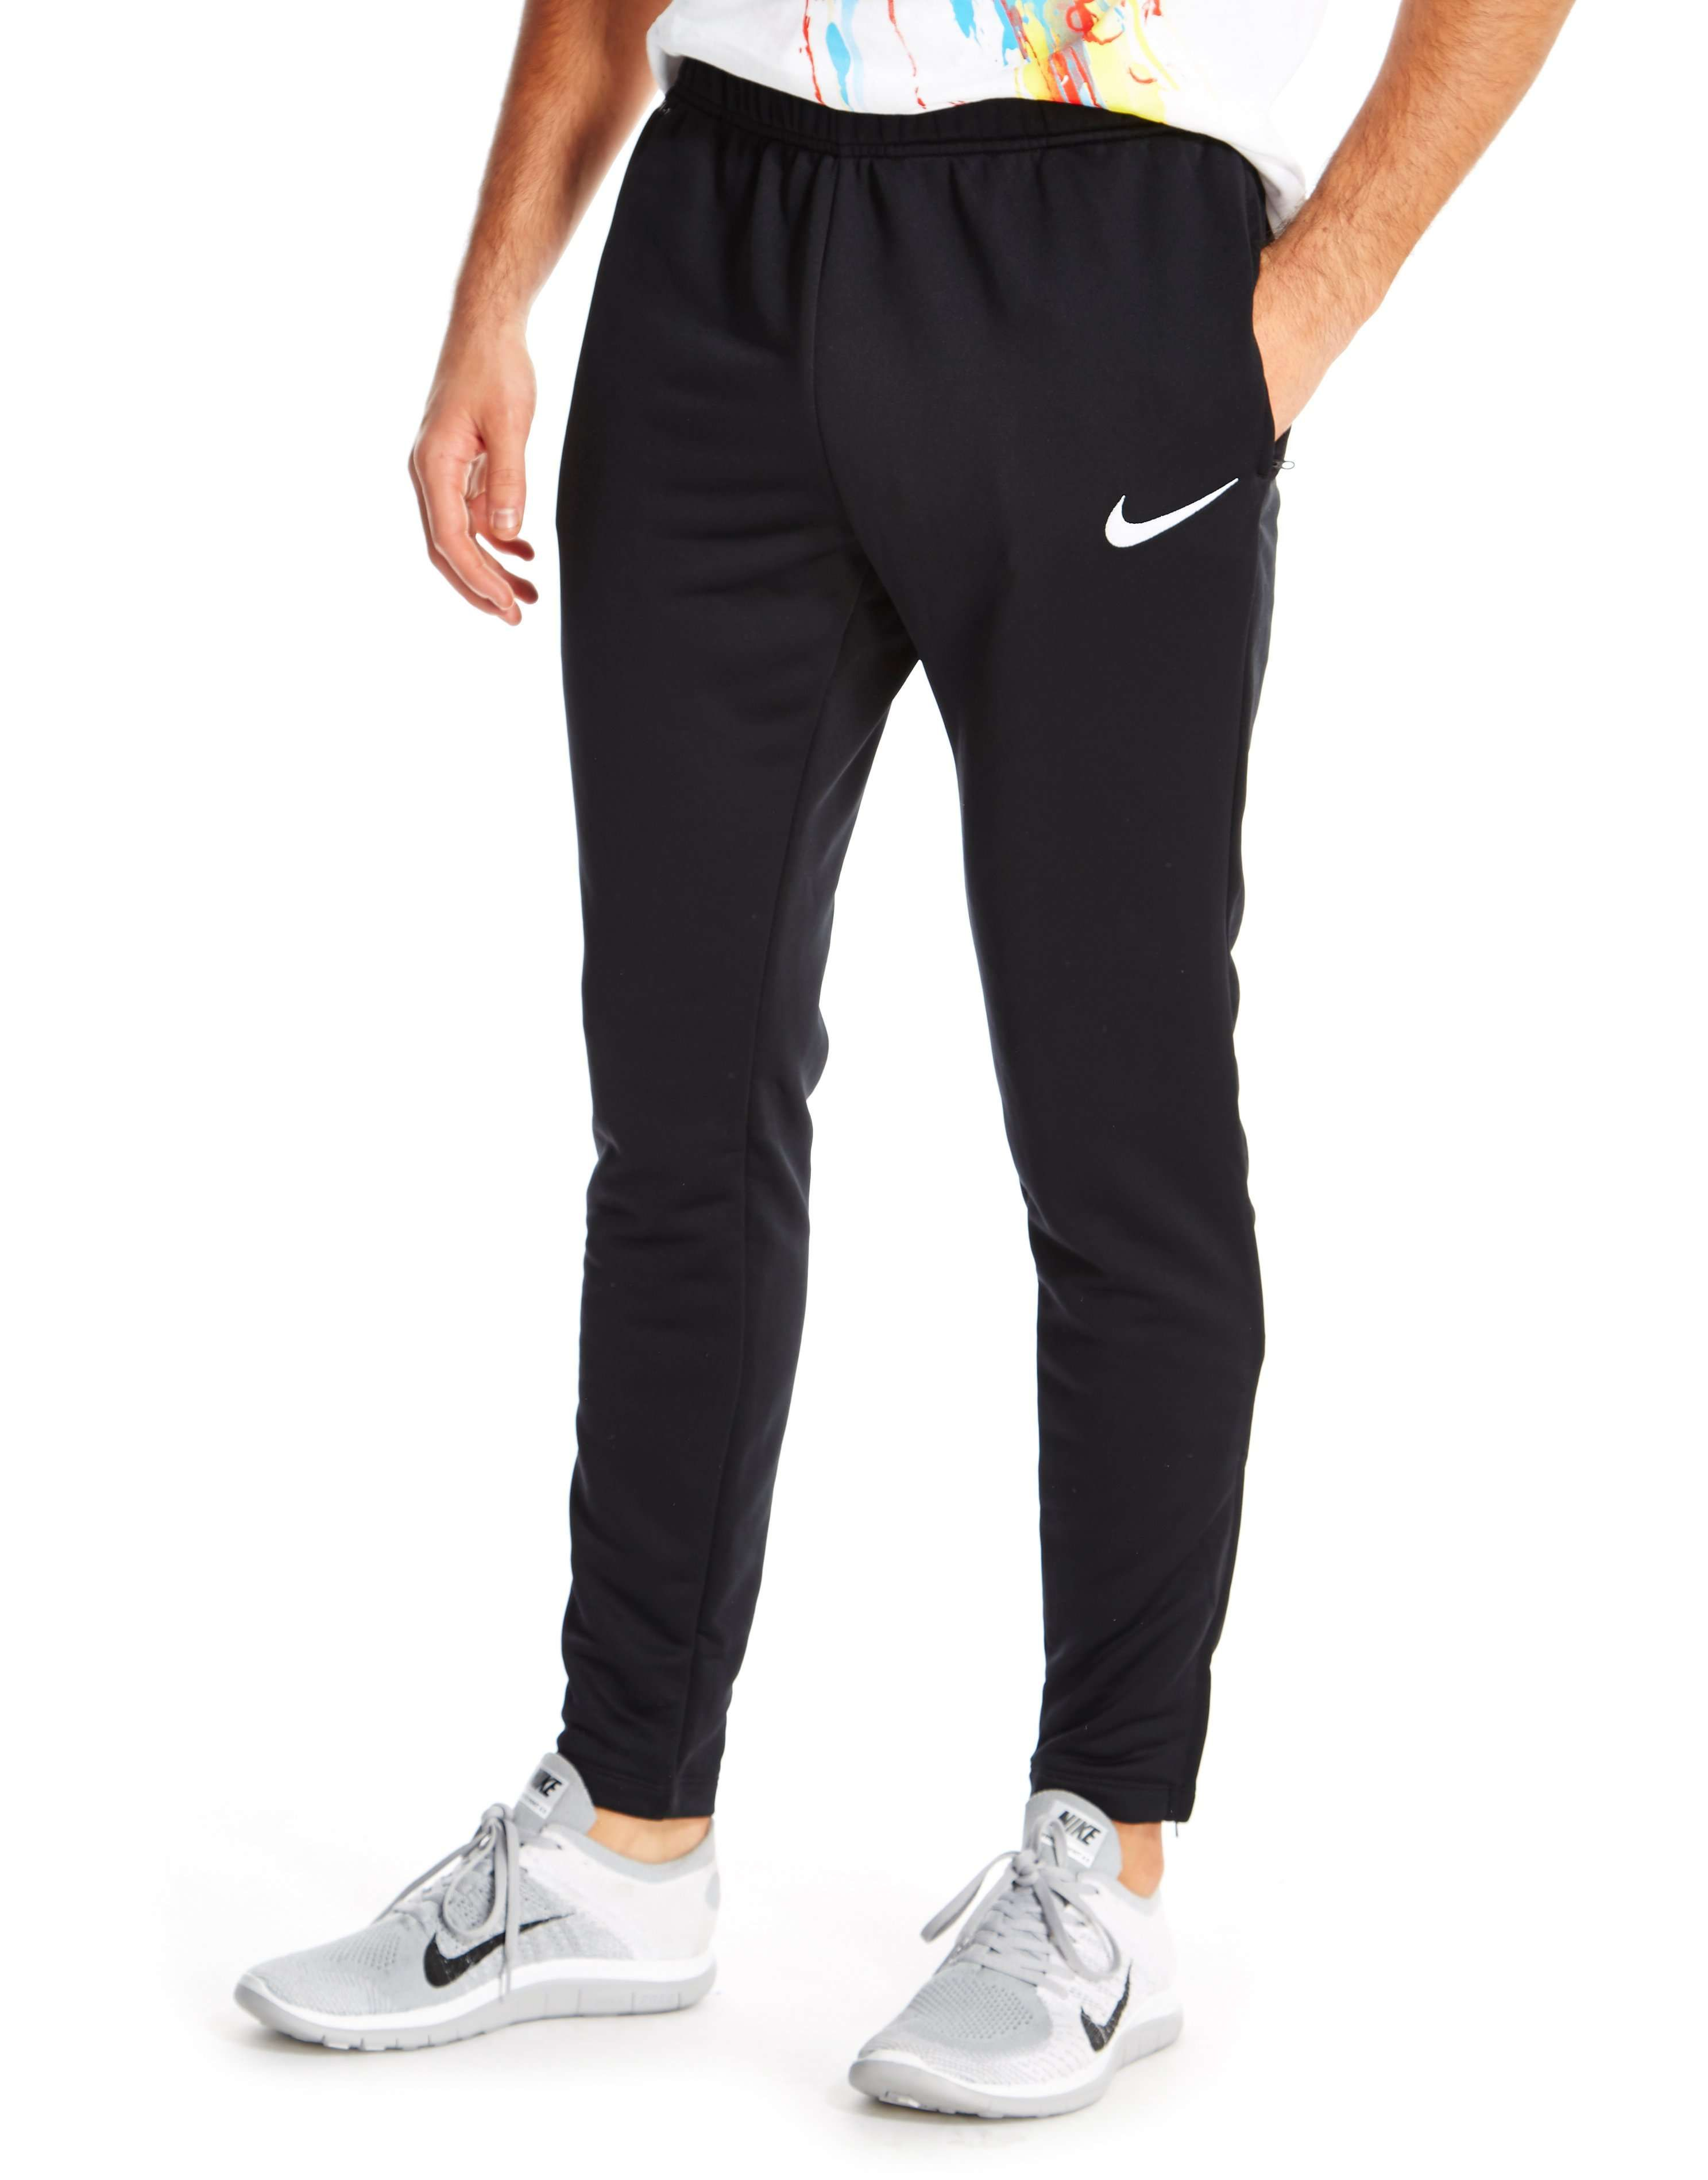 Nike Academy Tech Pants Shop online for Nike Academy